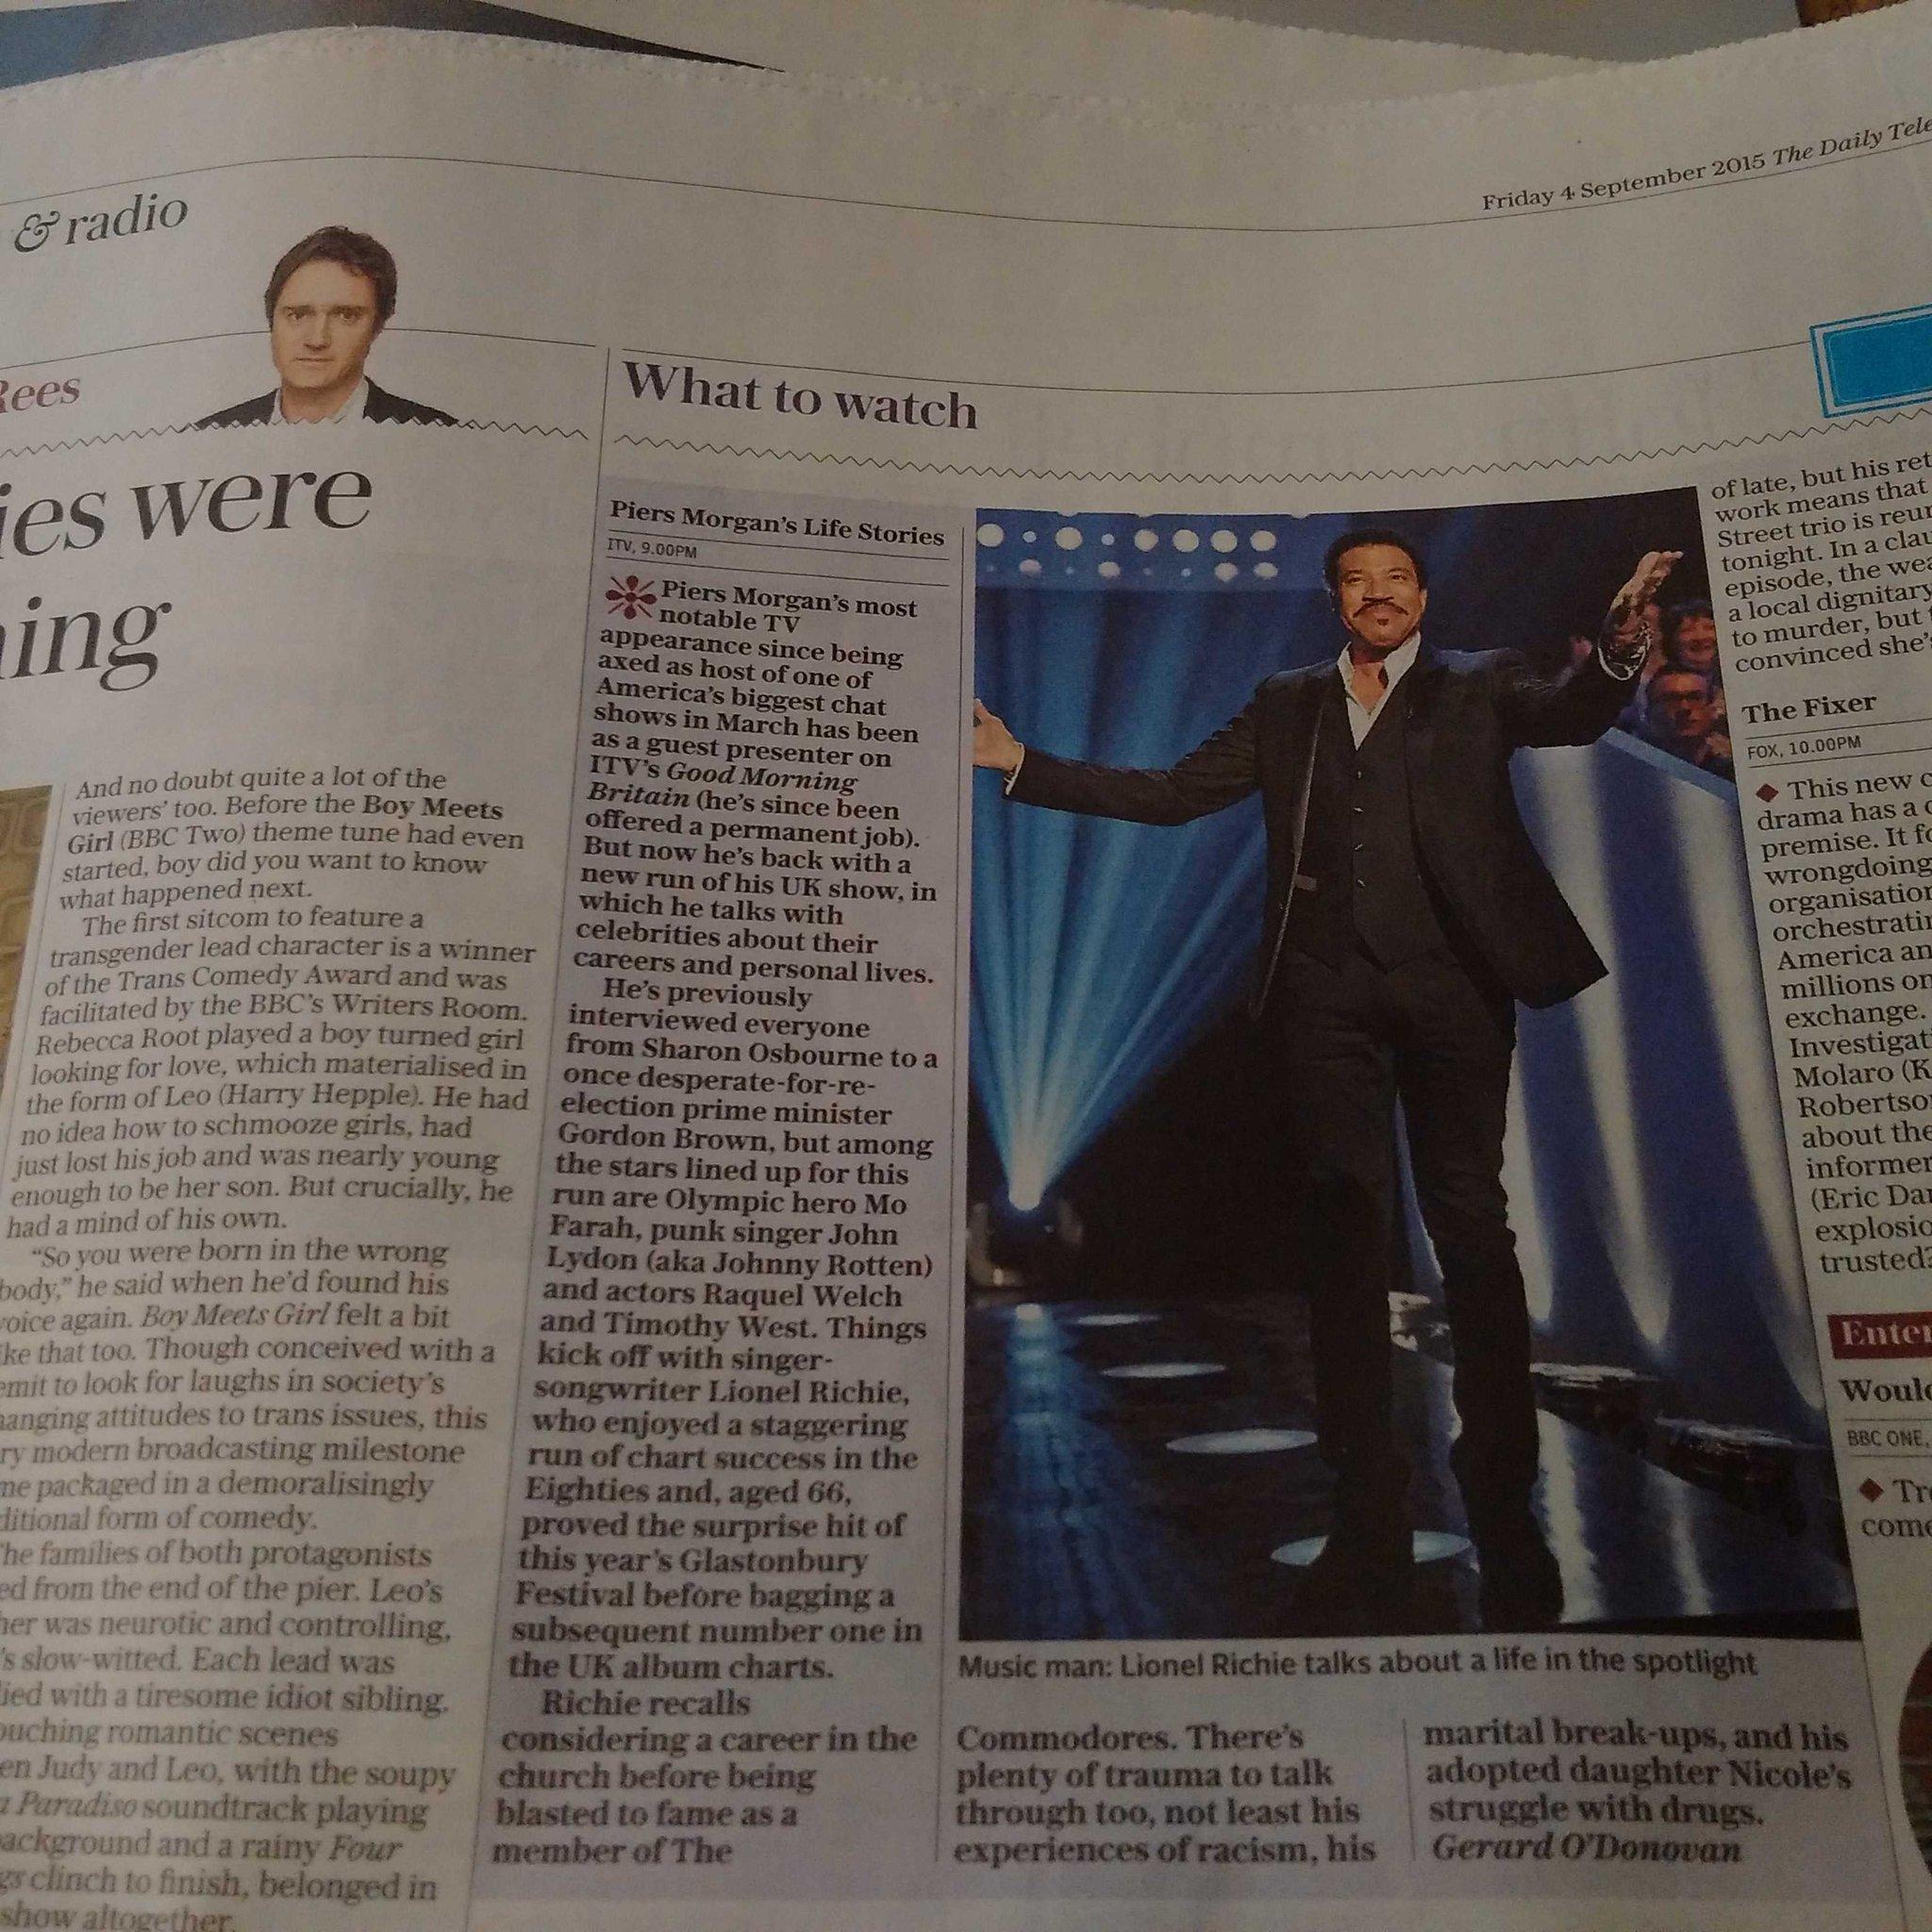 PICK OF THE DAY - @Telegraph #Lionel #LifeStories  ITV 9pm. http://t.co/e0D8Zv9reu